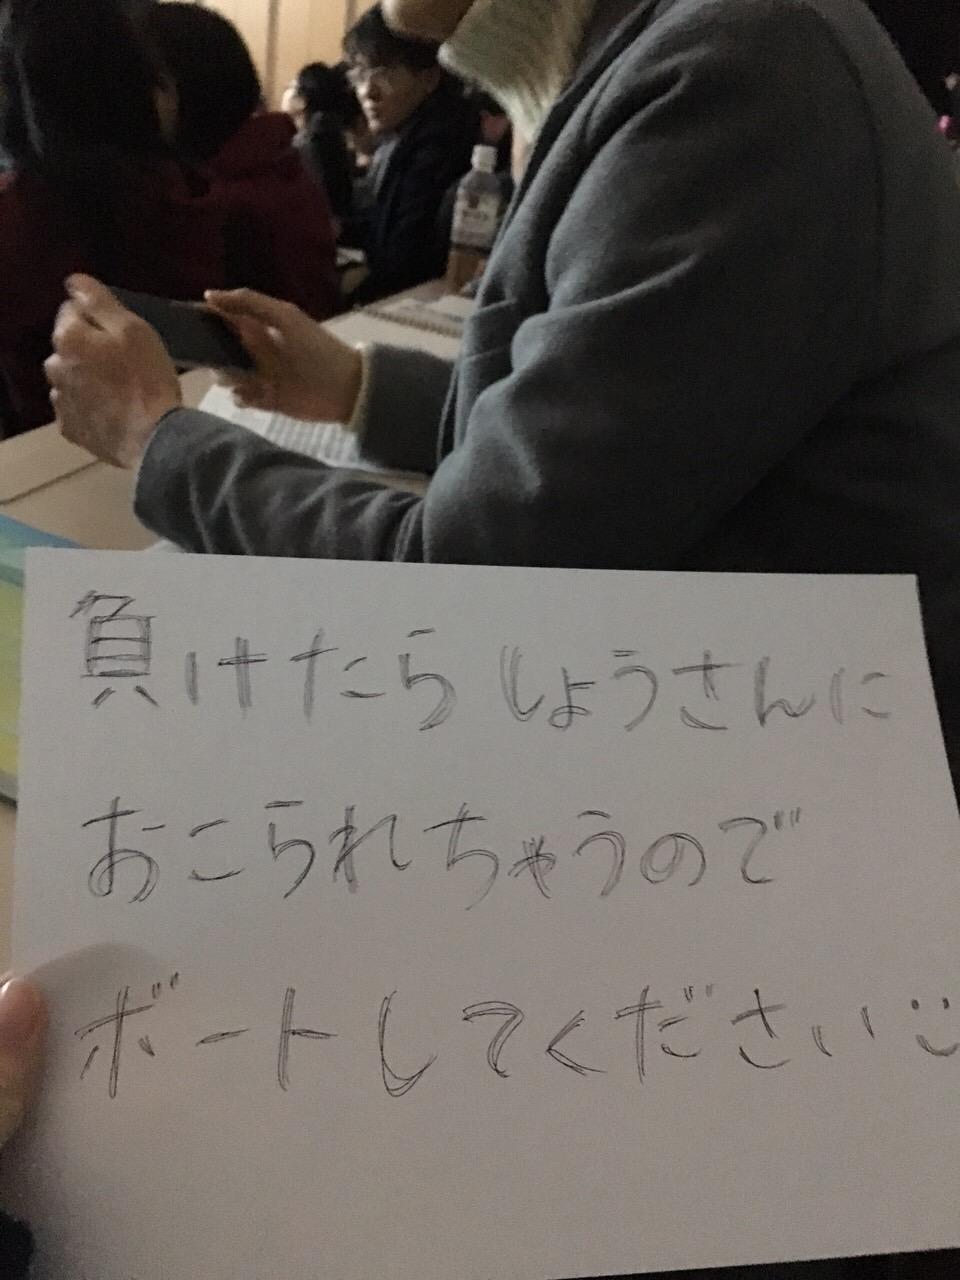 The Kansai1